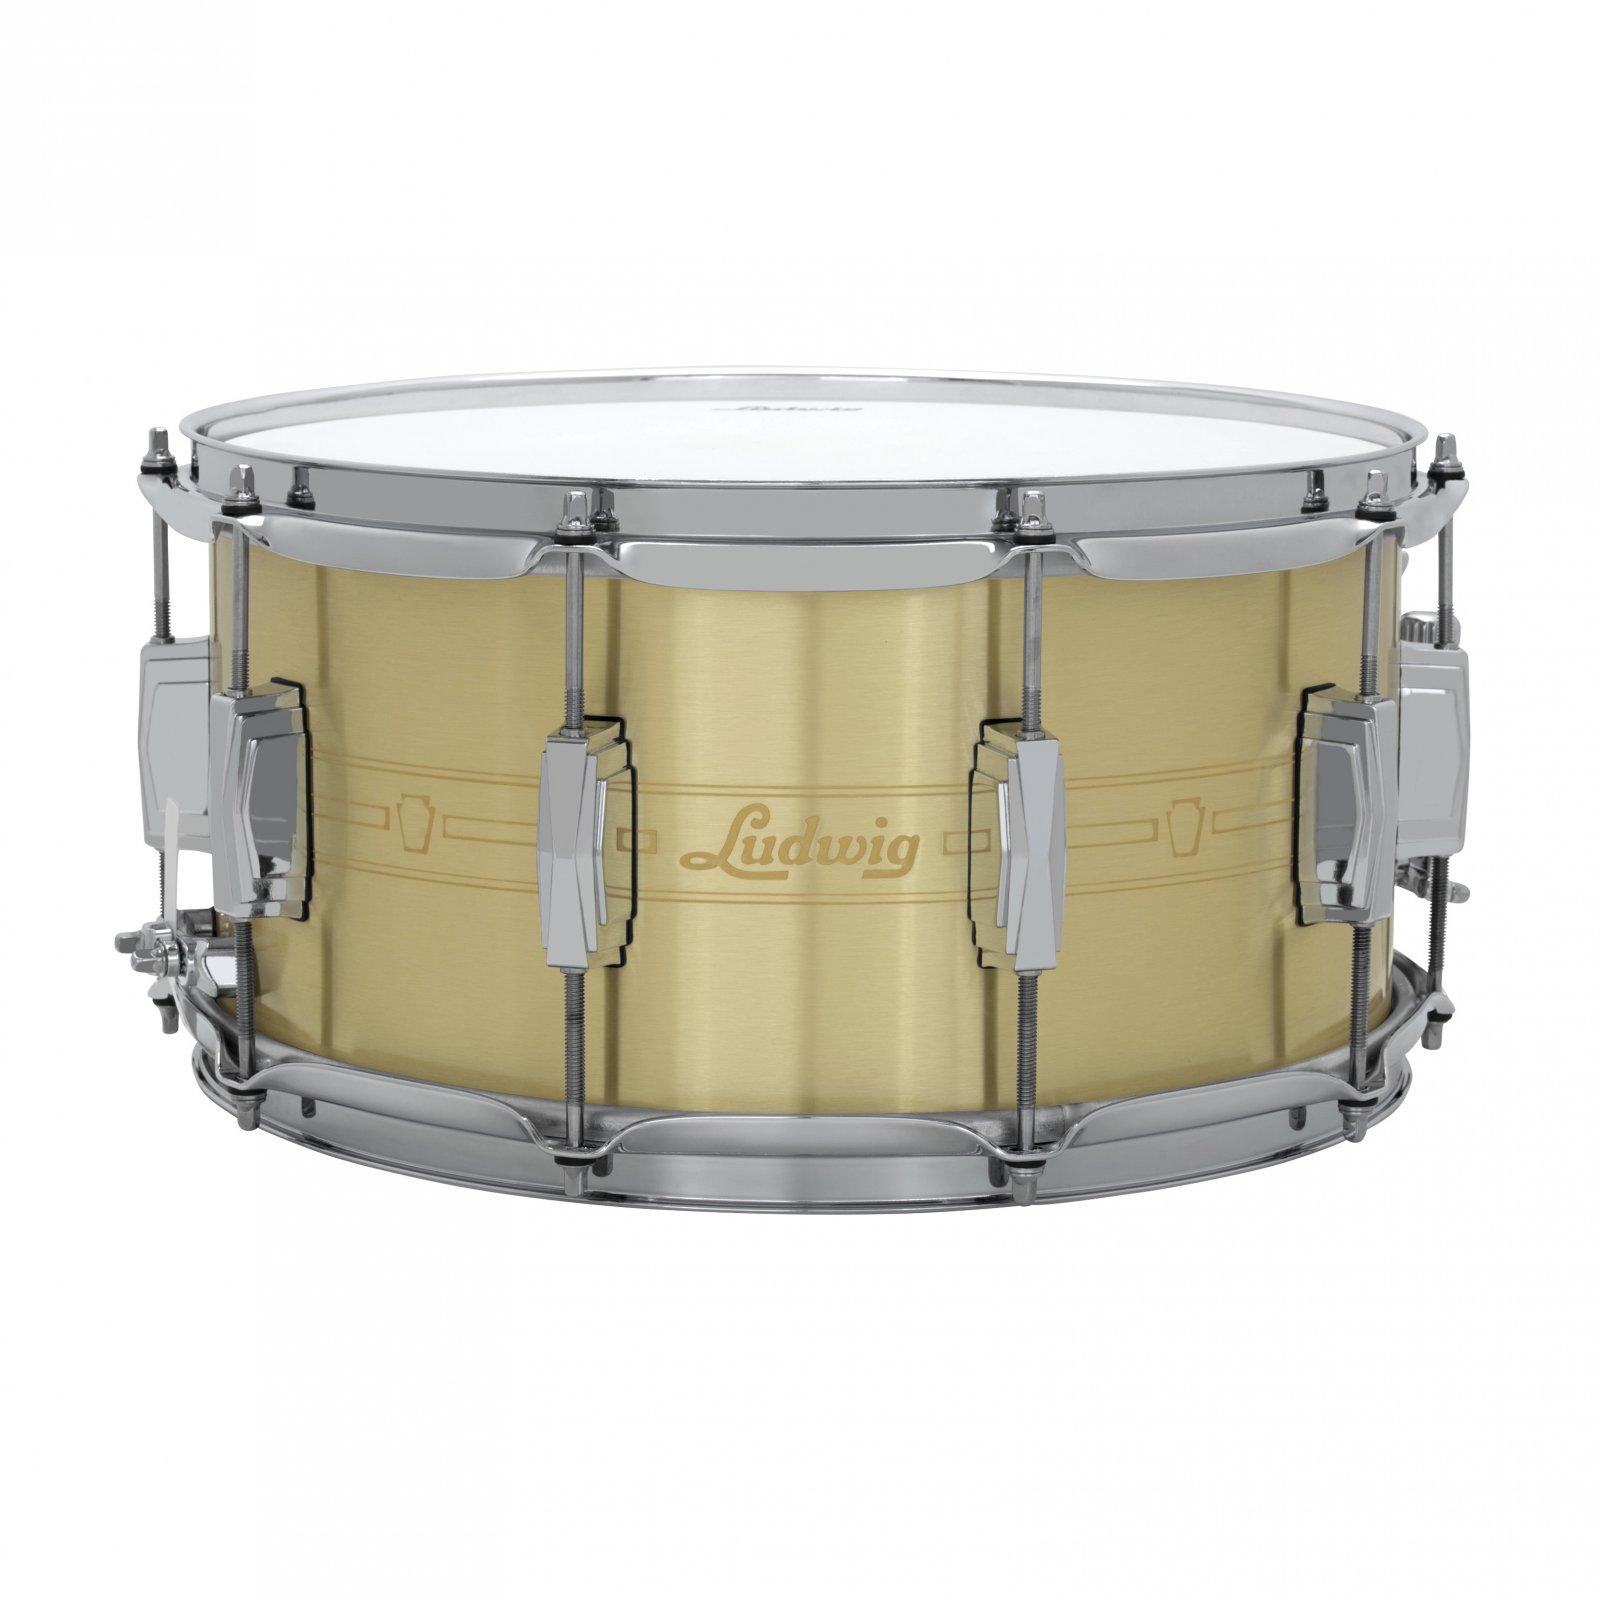 Ludwig Heirloom Brass Snare - 7x14